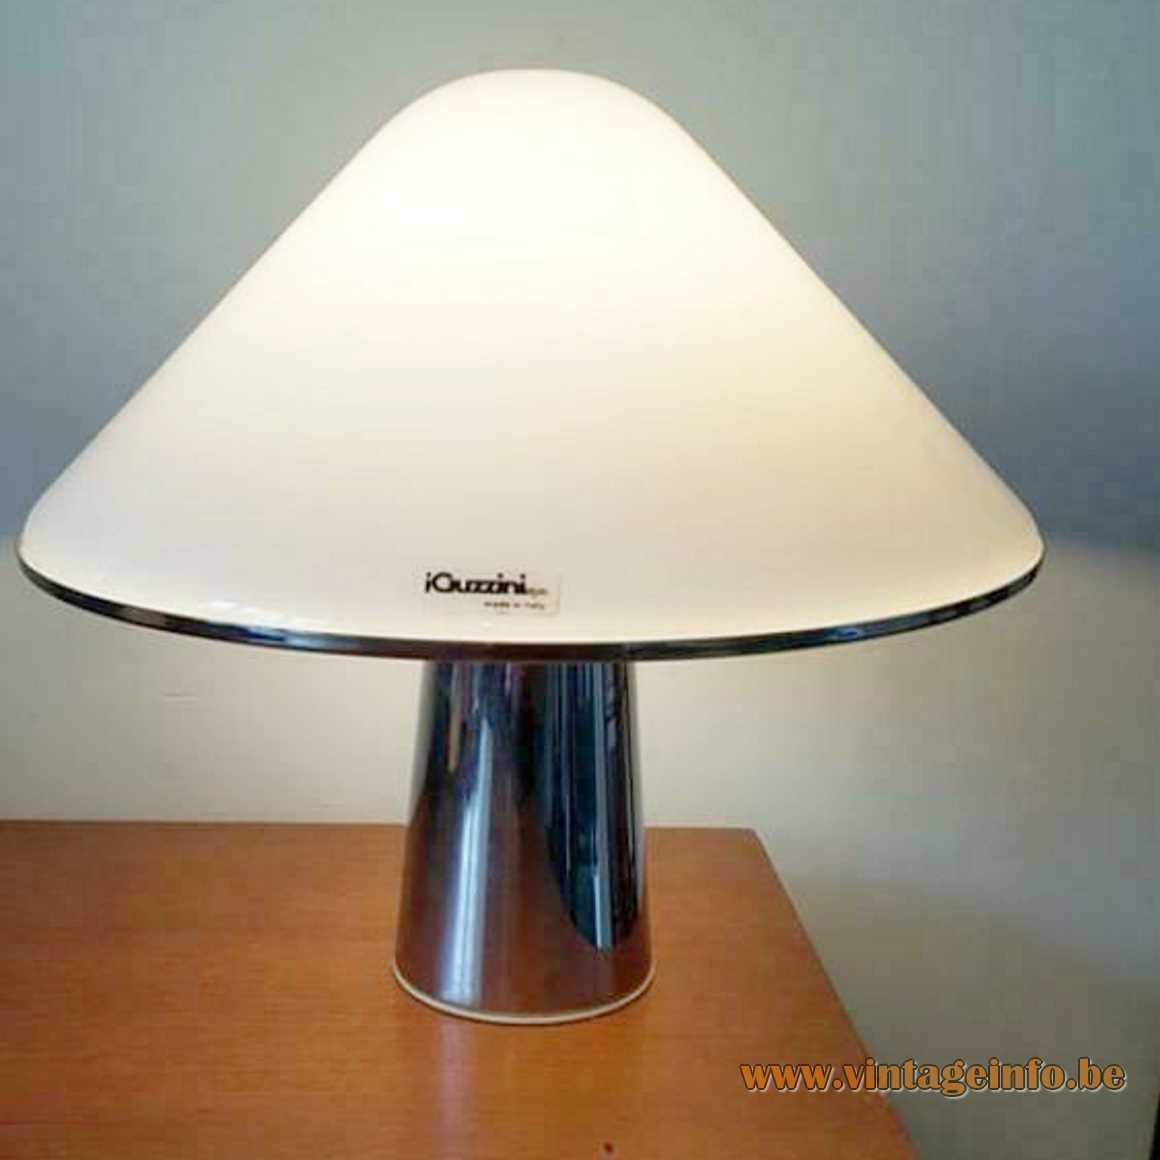 Harvey Guzzini Elpis Pendant Lamp - Table Lamp Version - 1960s, 1970s, iGuzzini, Meblo